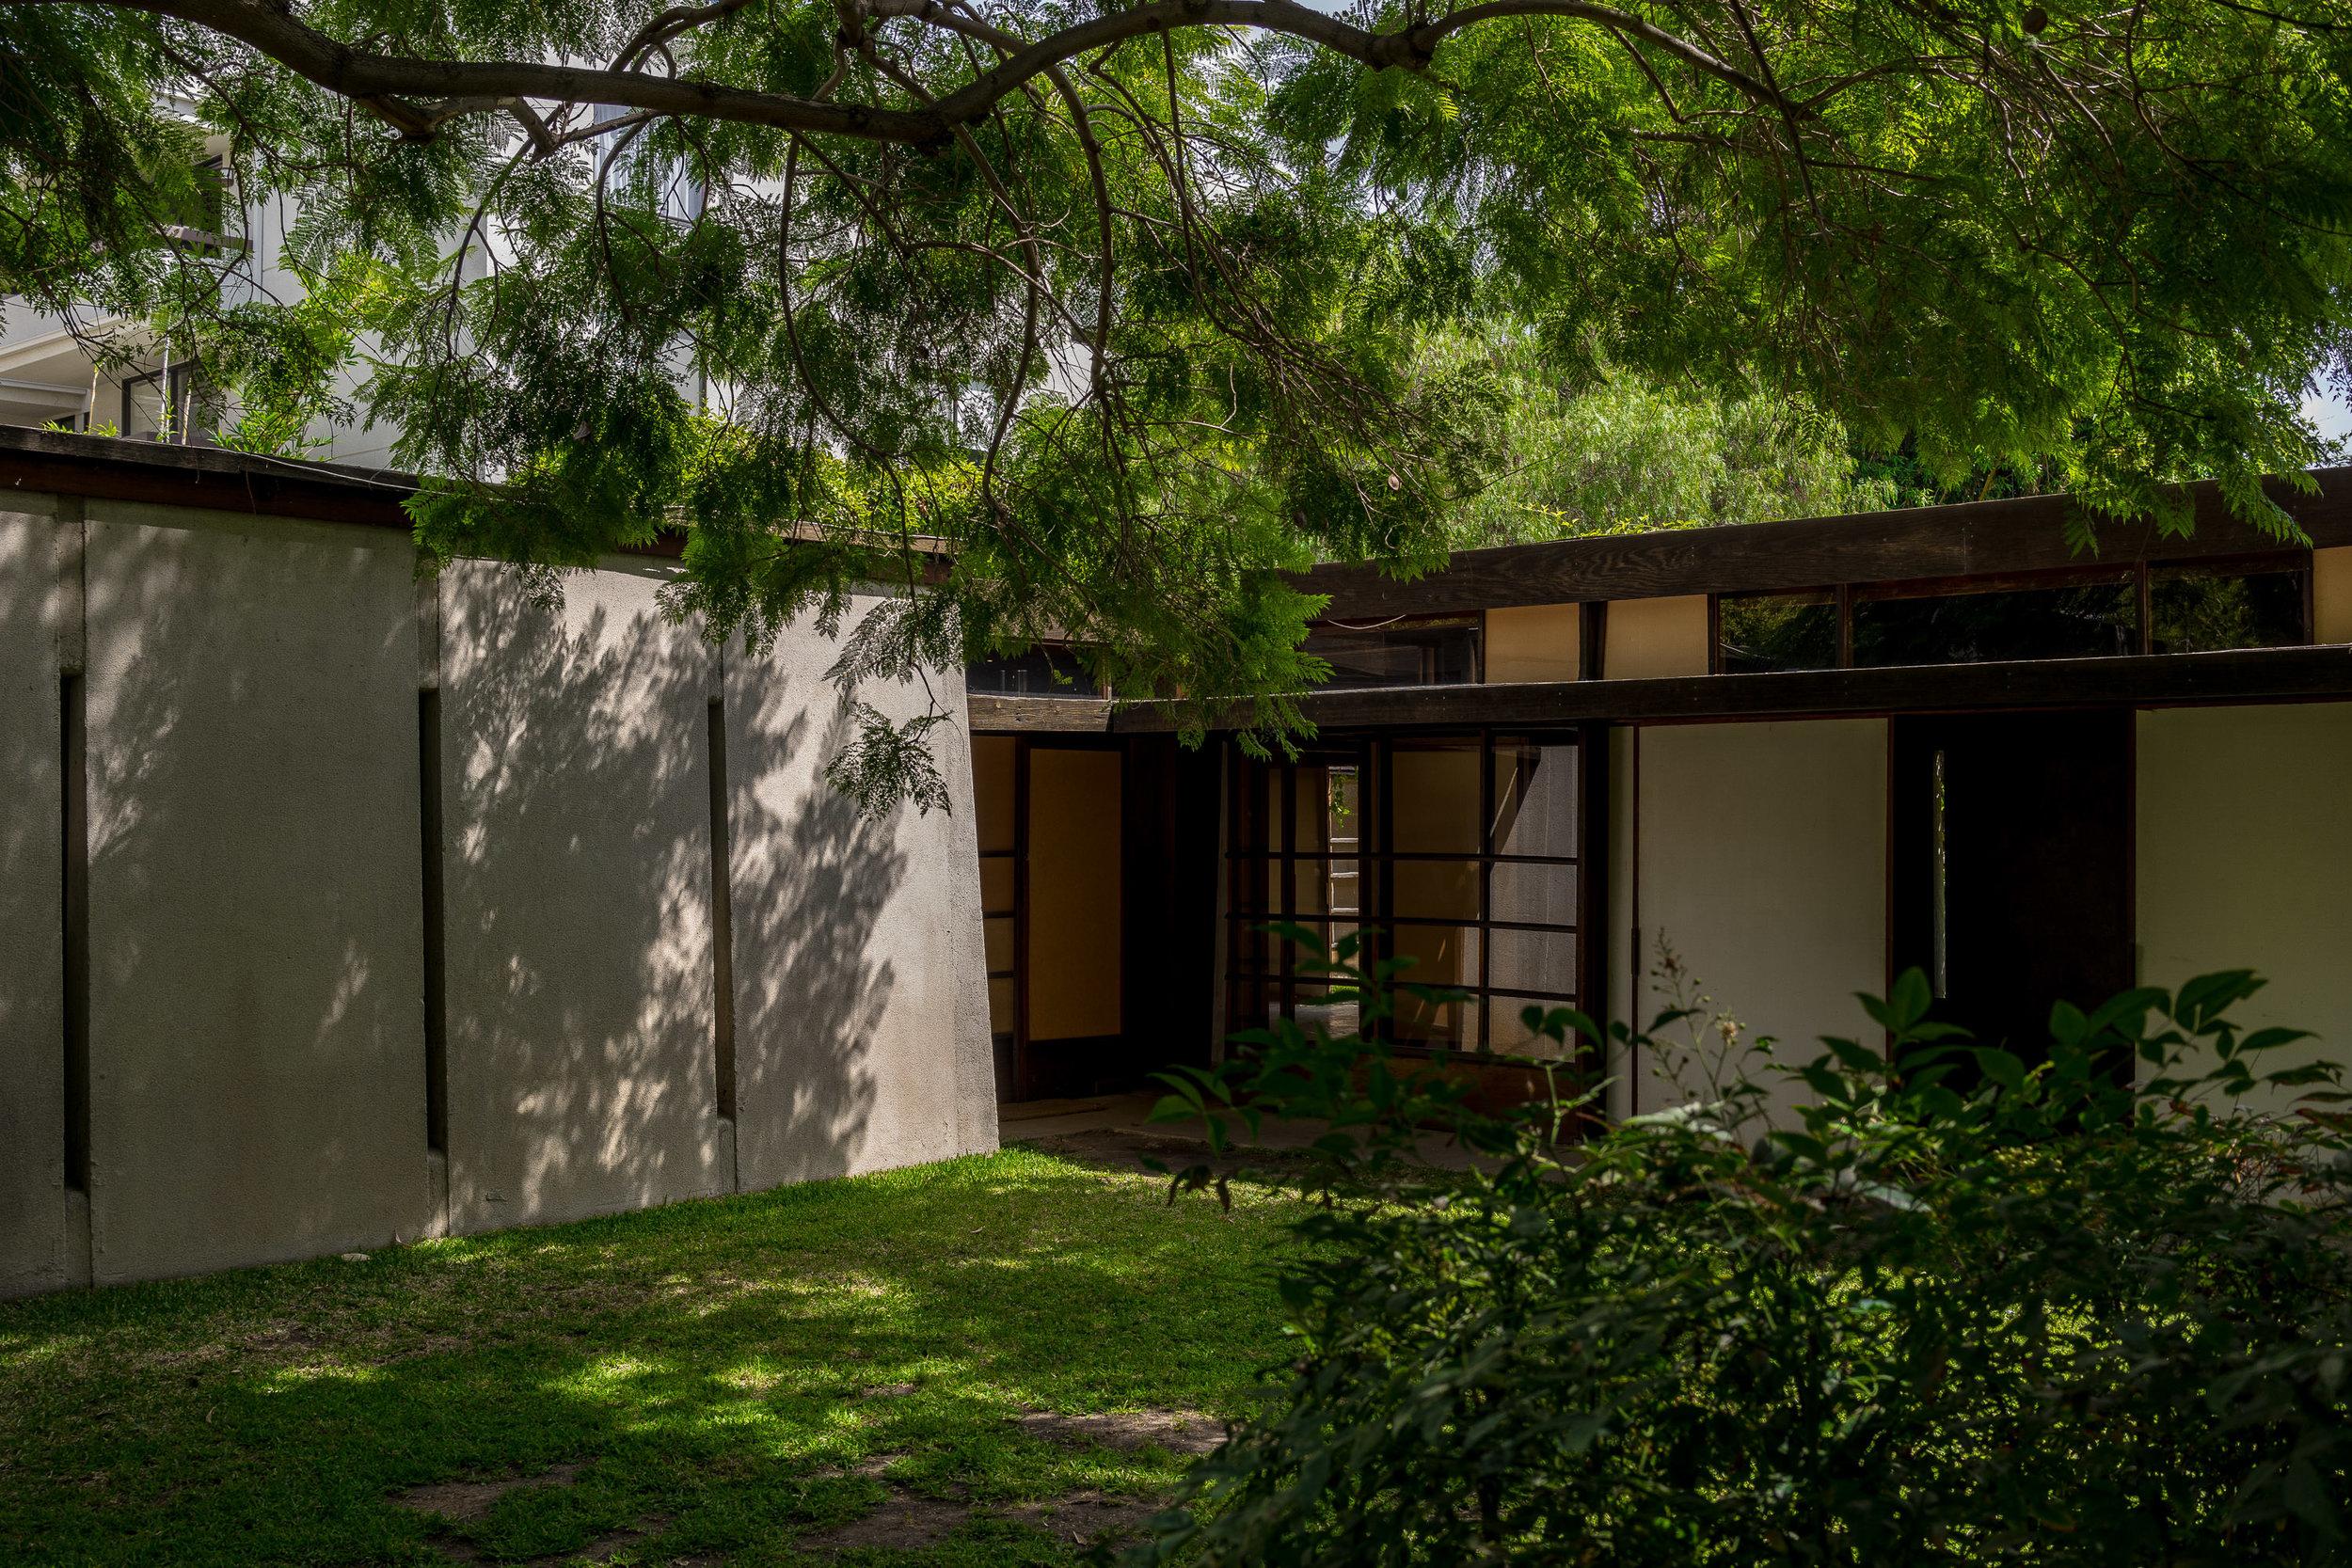 MYBELONGING-SCHINDLER-HOUSE-CASE-STUDY-LOS-ANGELES-ARCHITECTURE-PHOTOGRAPHY-12.jpg